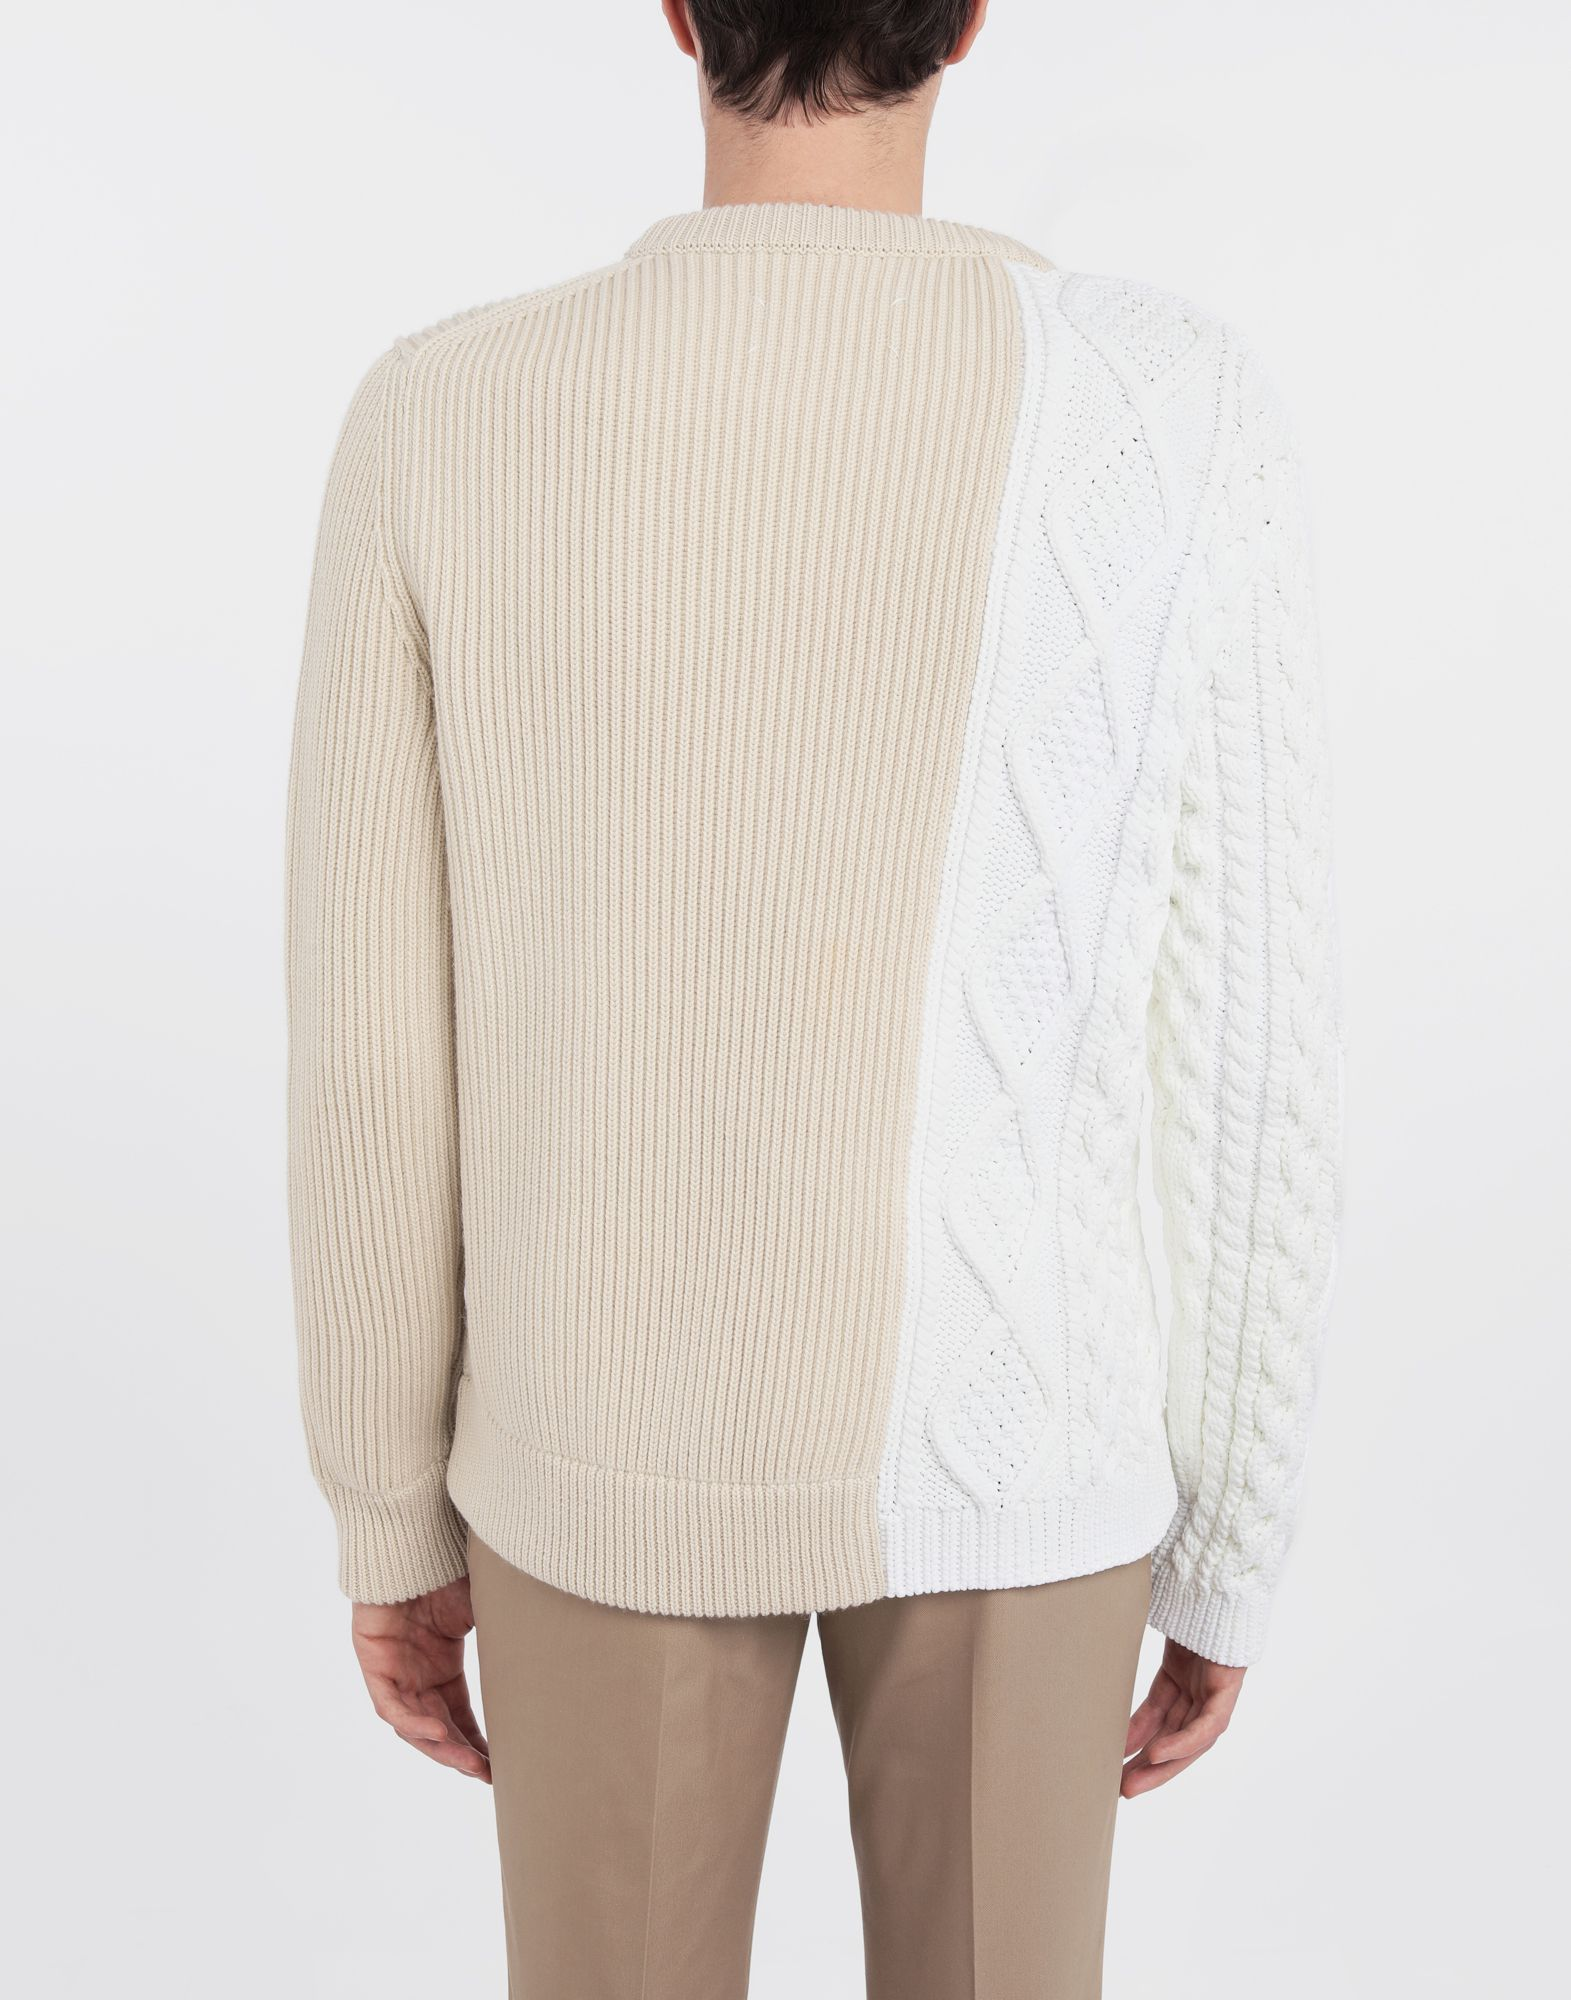 MAISON MARGIELA Spliced knit pullover Crewneck sweater Man e